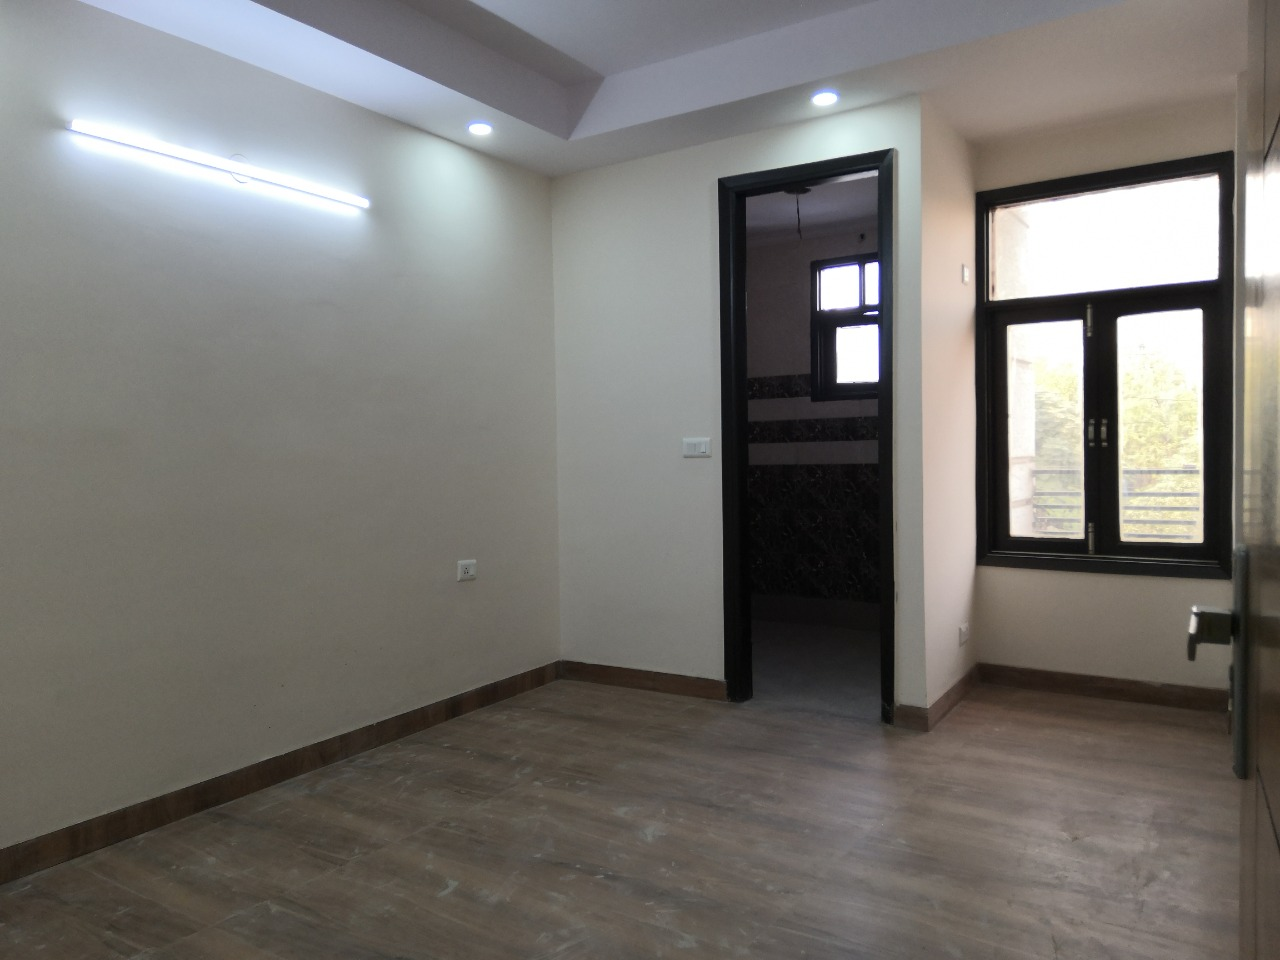 3 bhk flats in chattarpur